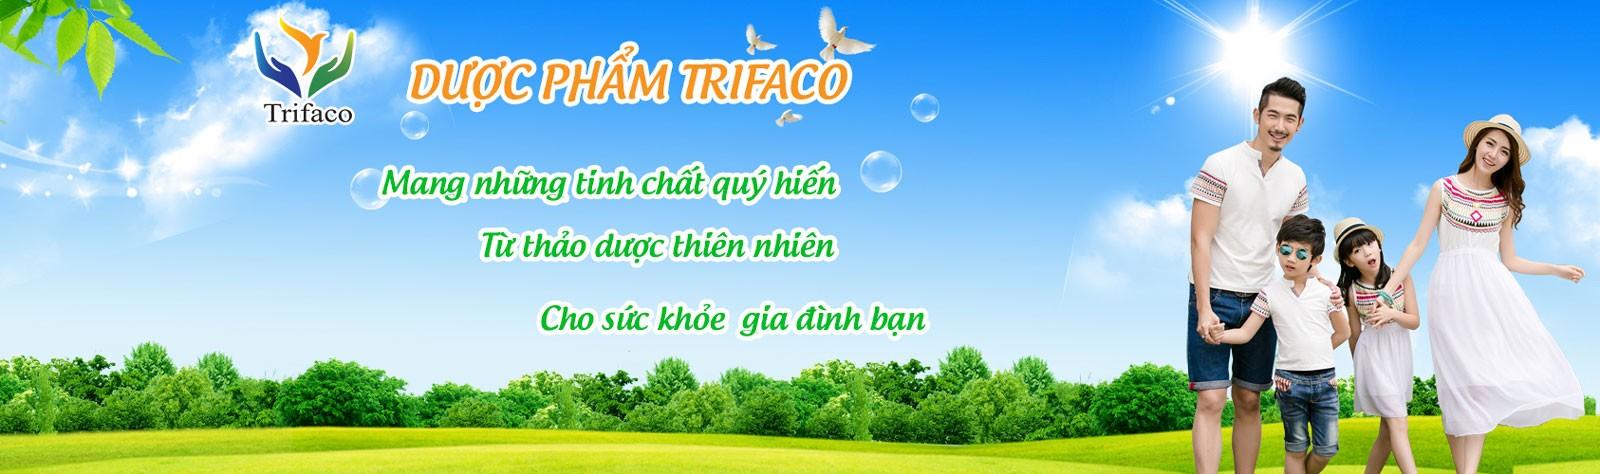 Slide Trifaco 06